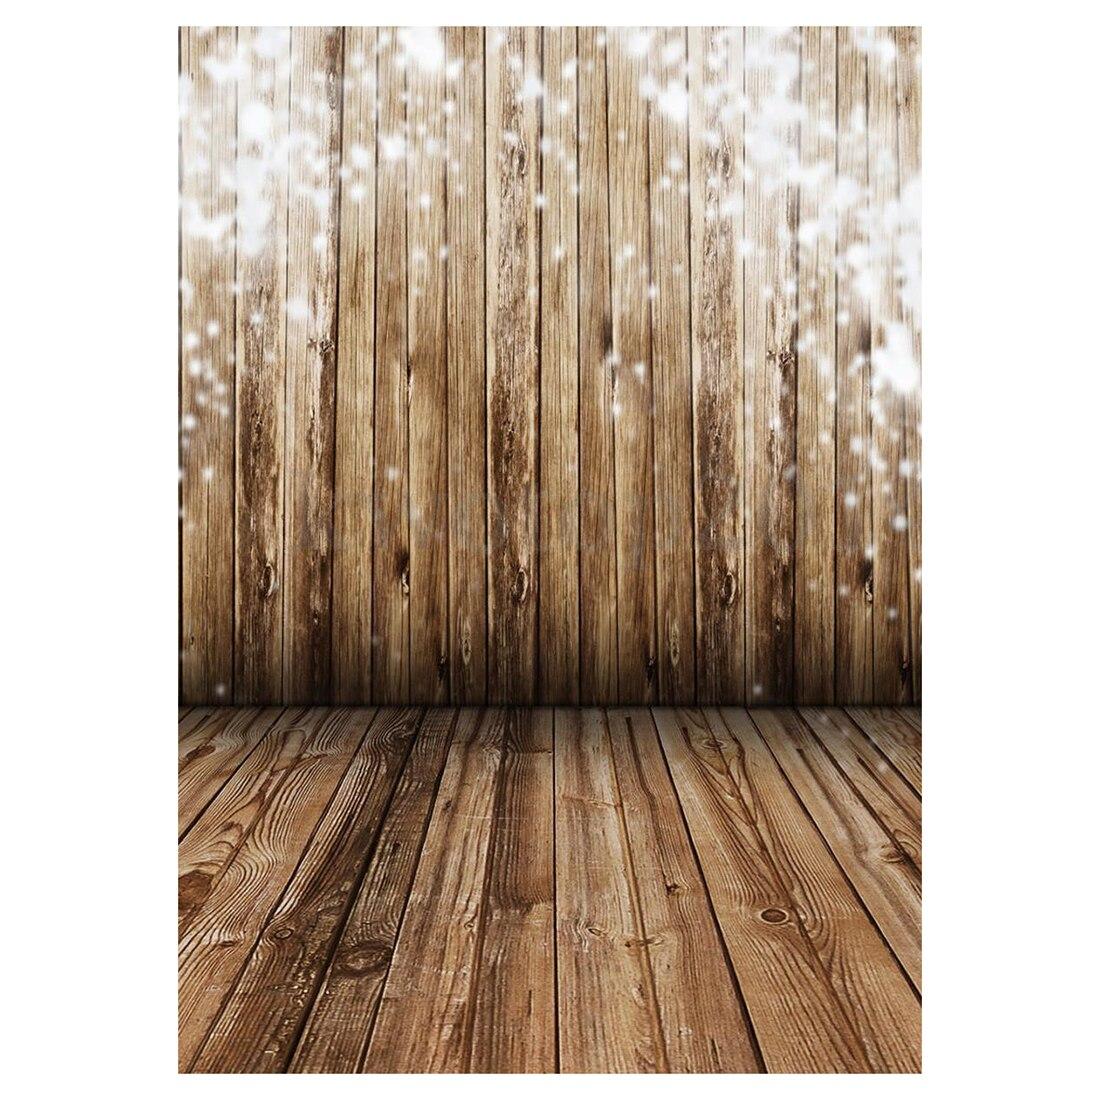 3X5FT Wood Wall Floor Vinyl Photography Backdrop Photo Background Studio Props